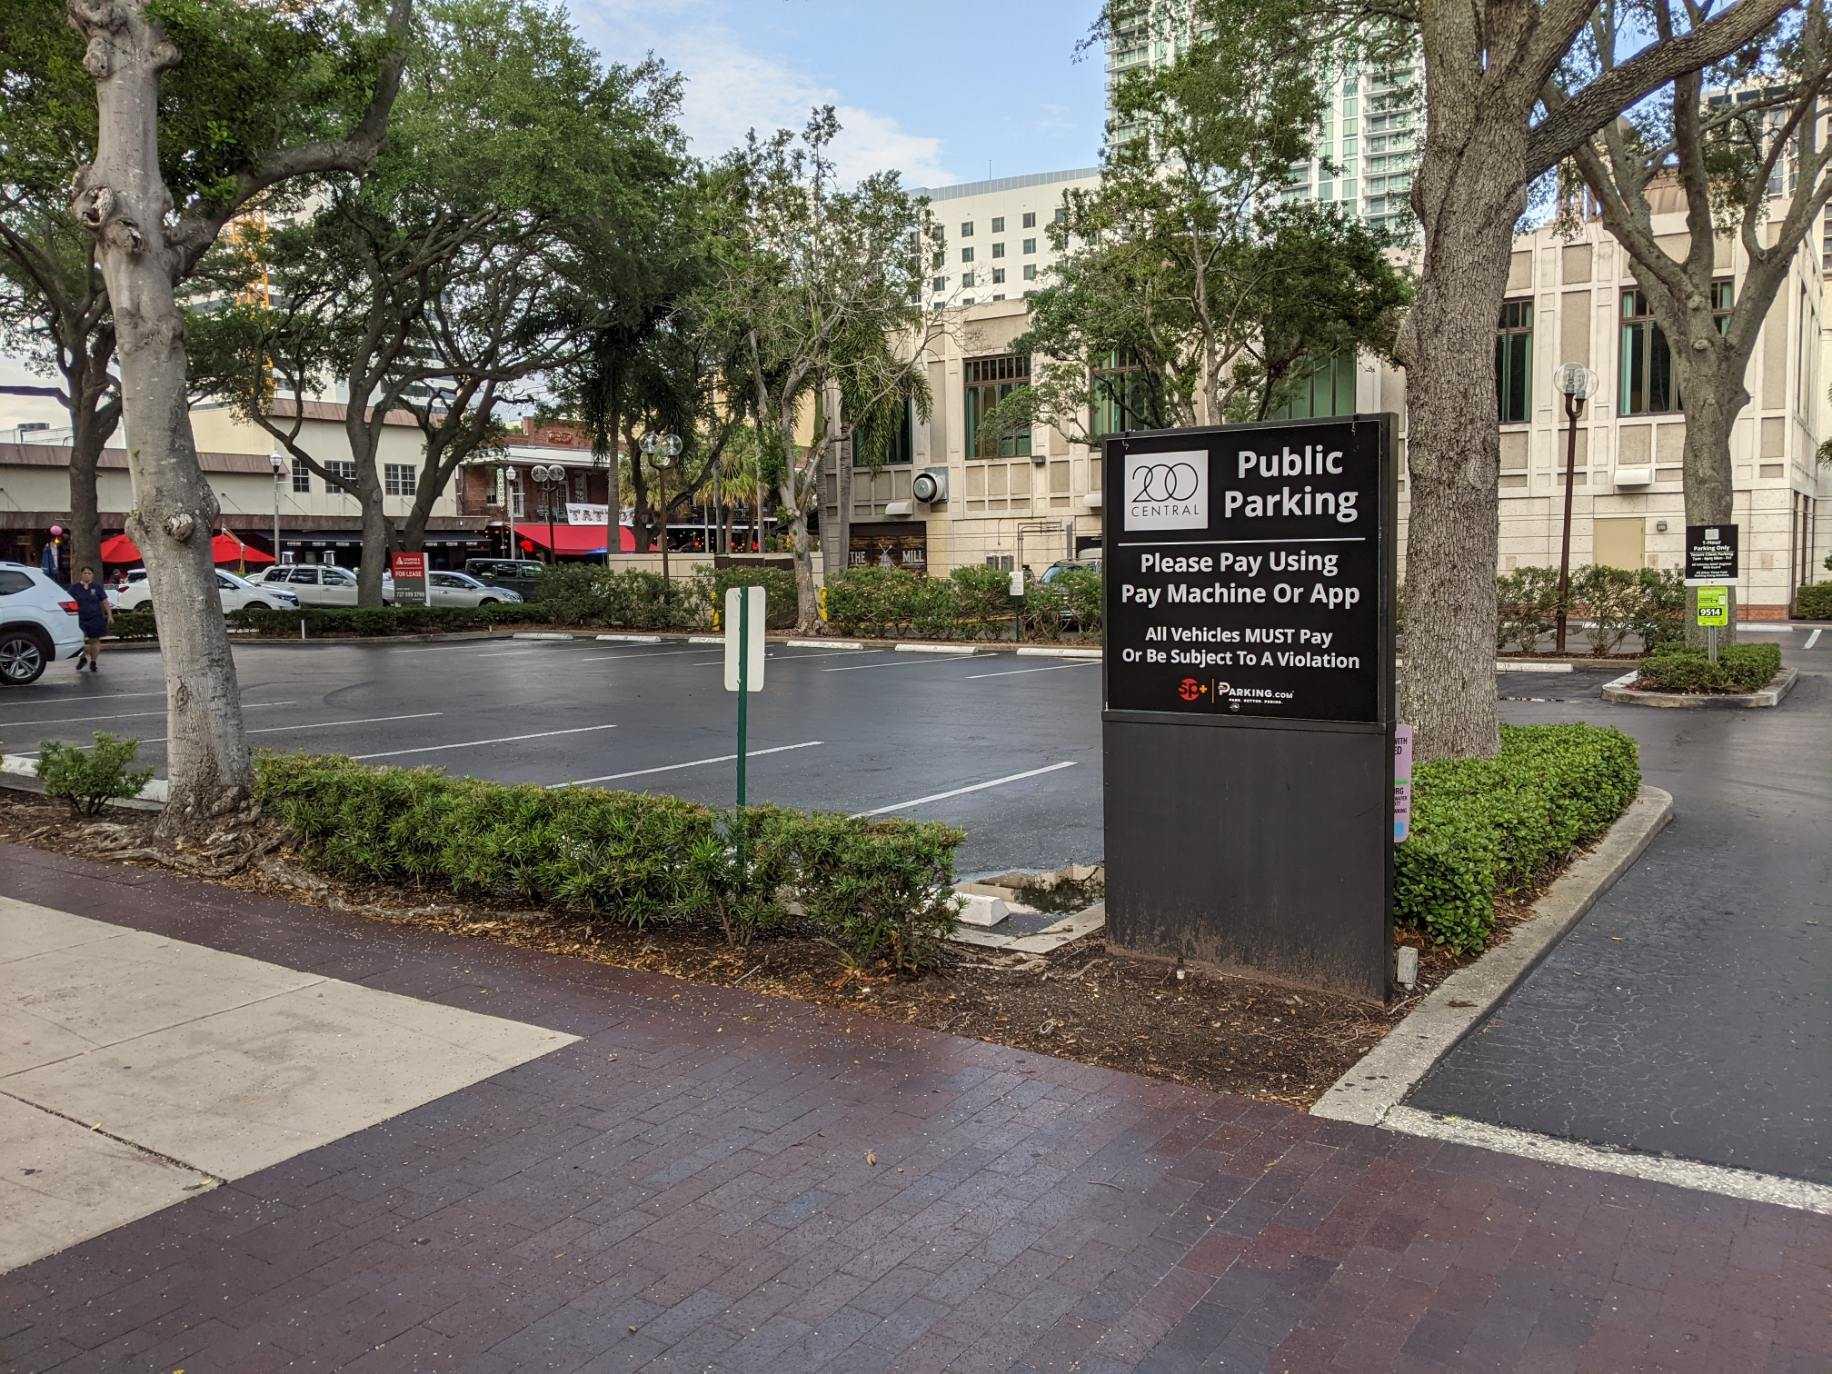 Location signage